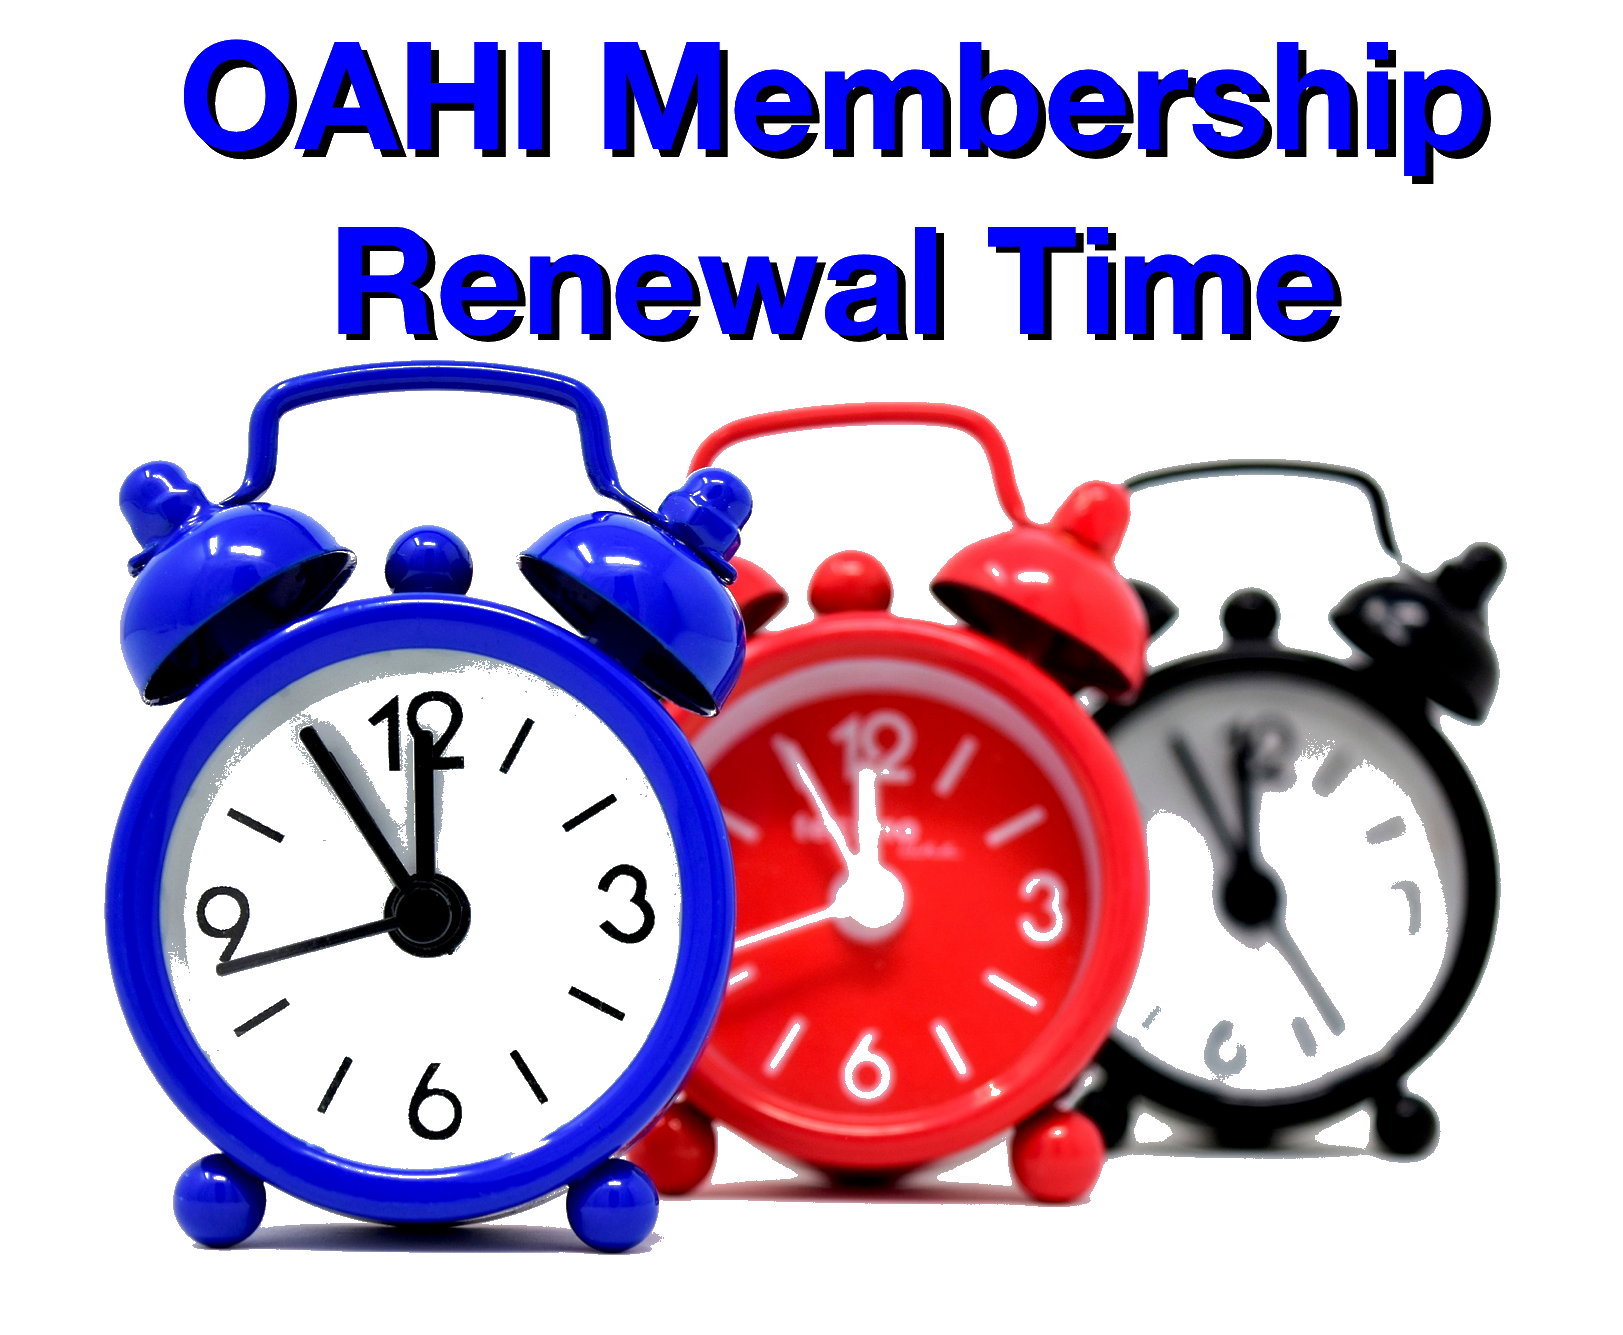 oahi_renewal_time_tpng.png